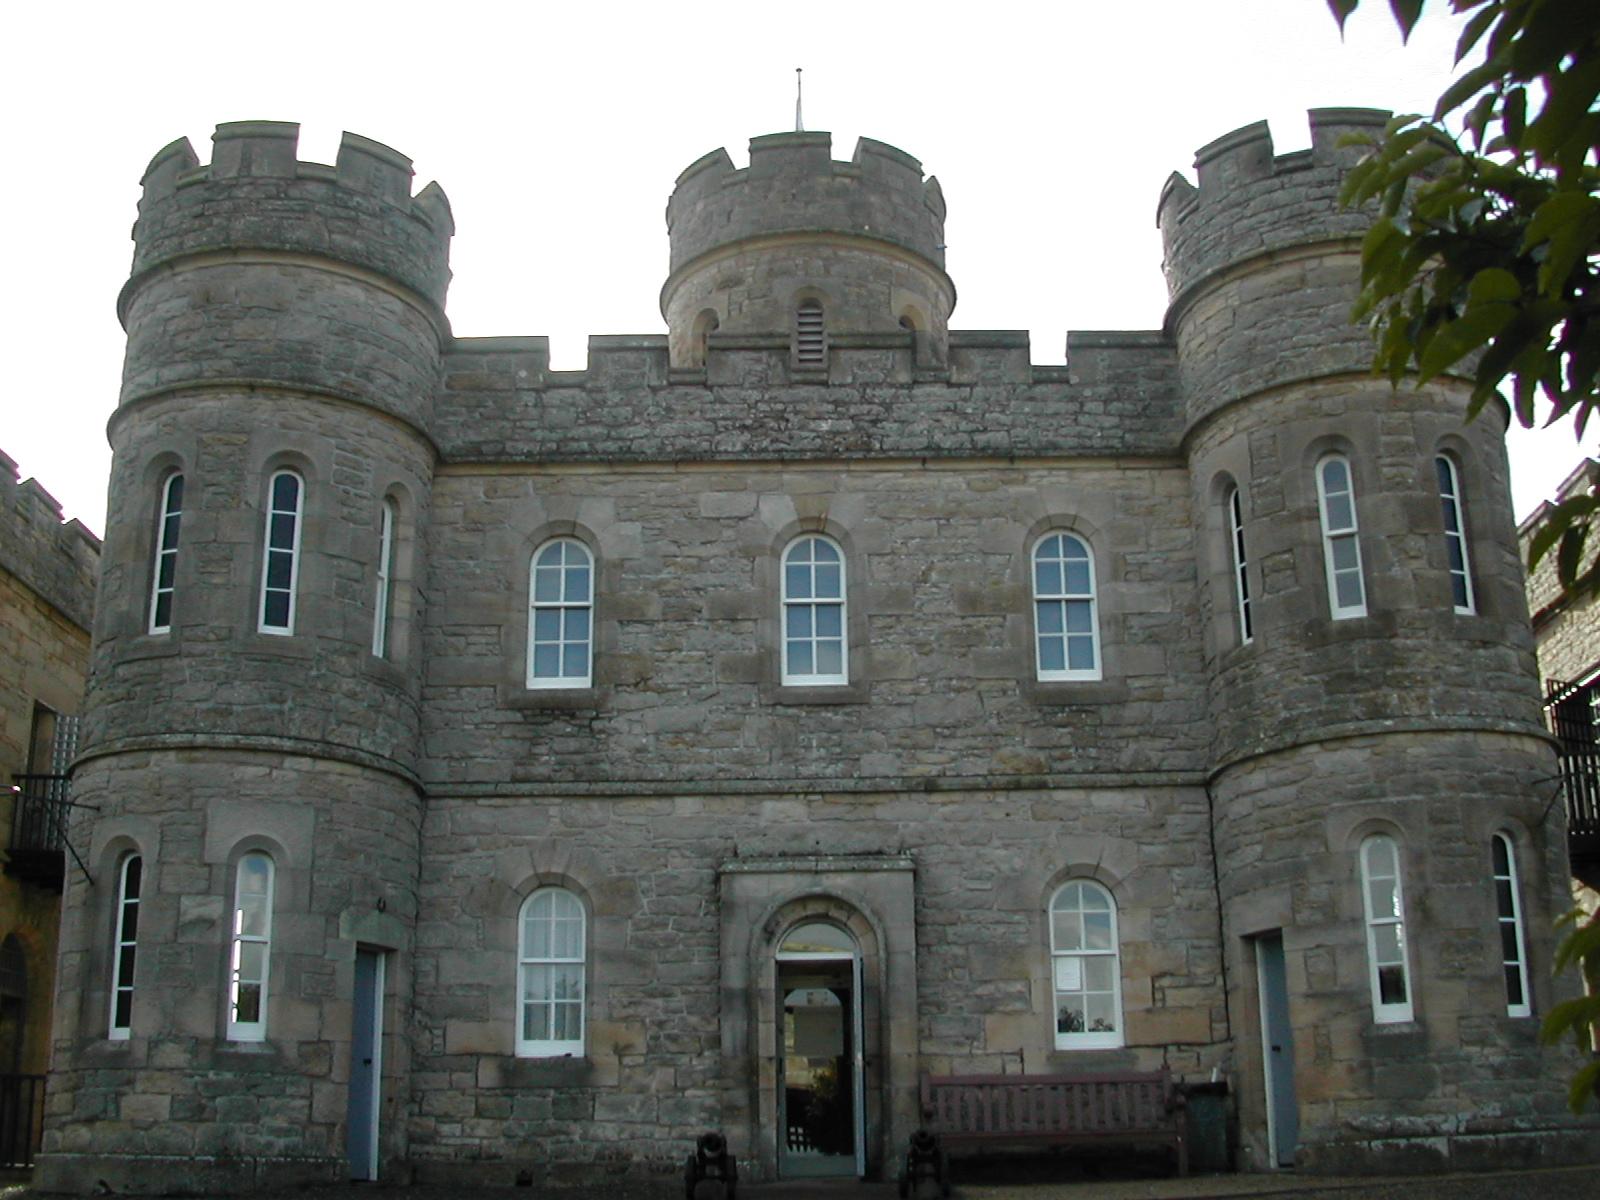 Front of Jedburgh Castle